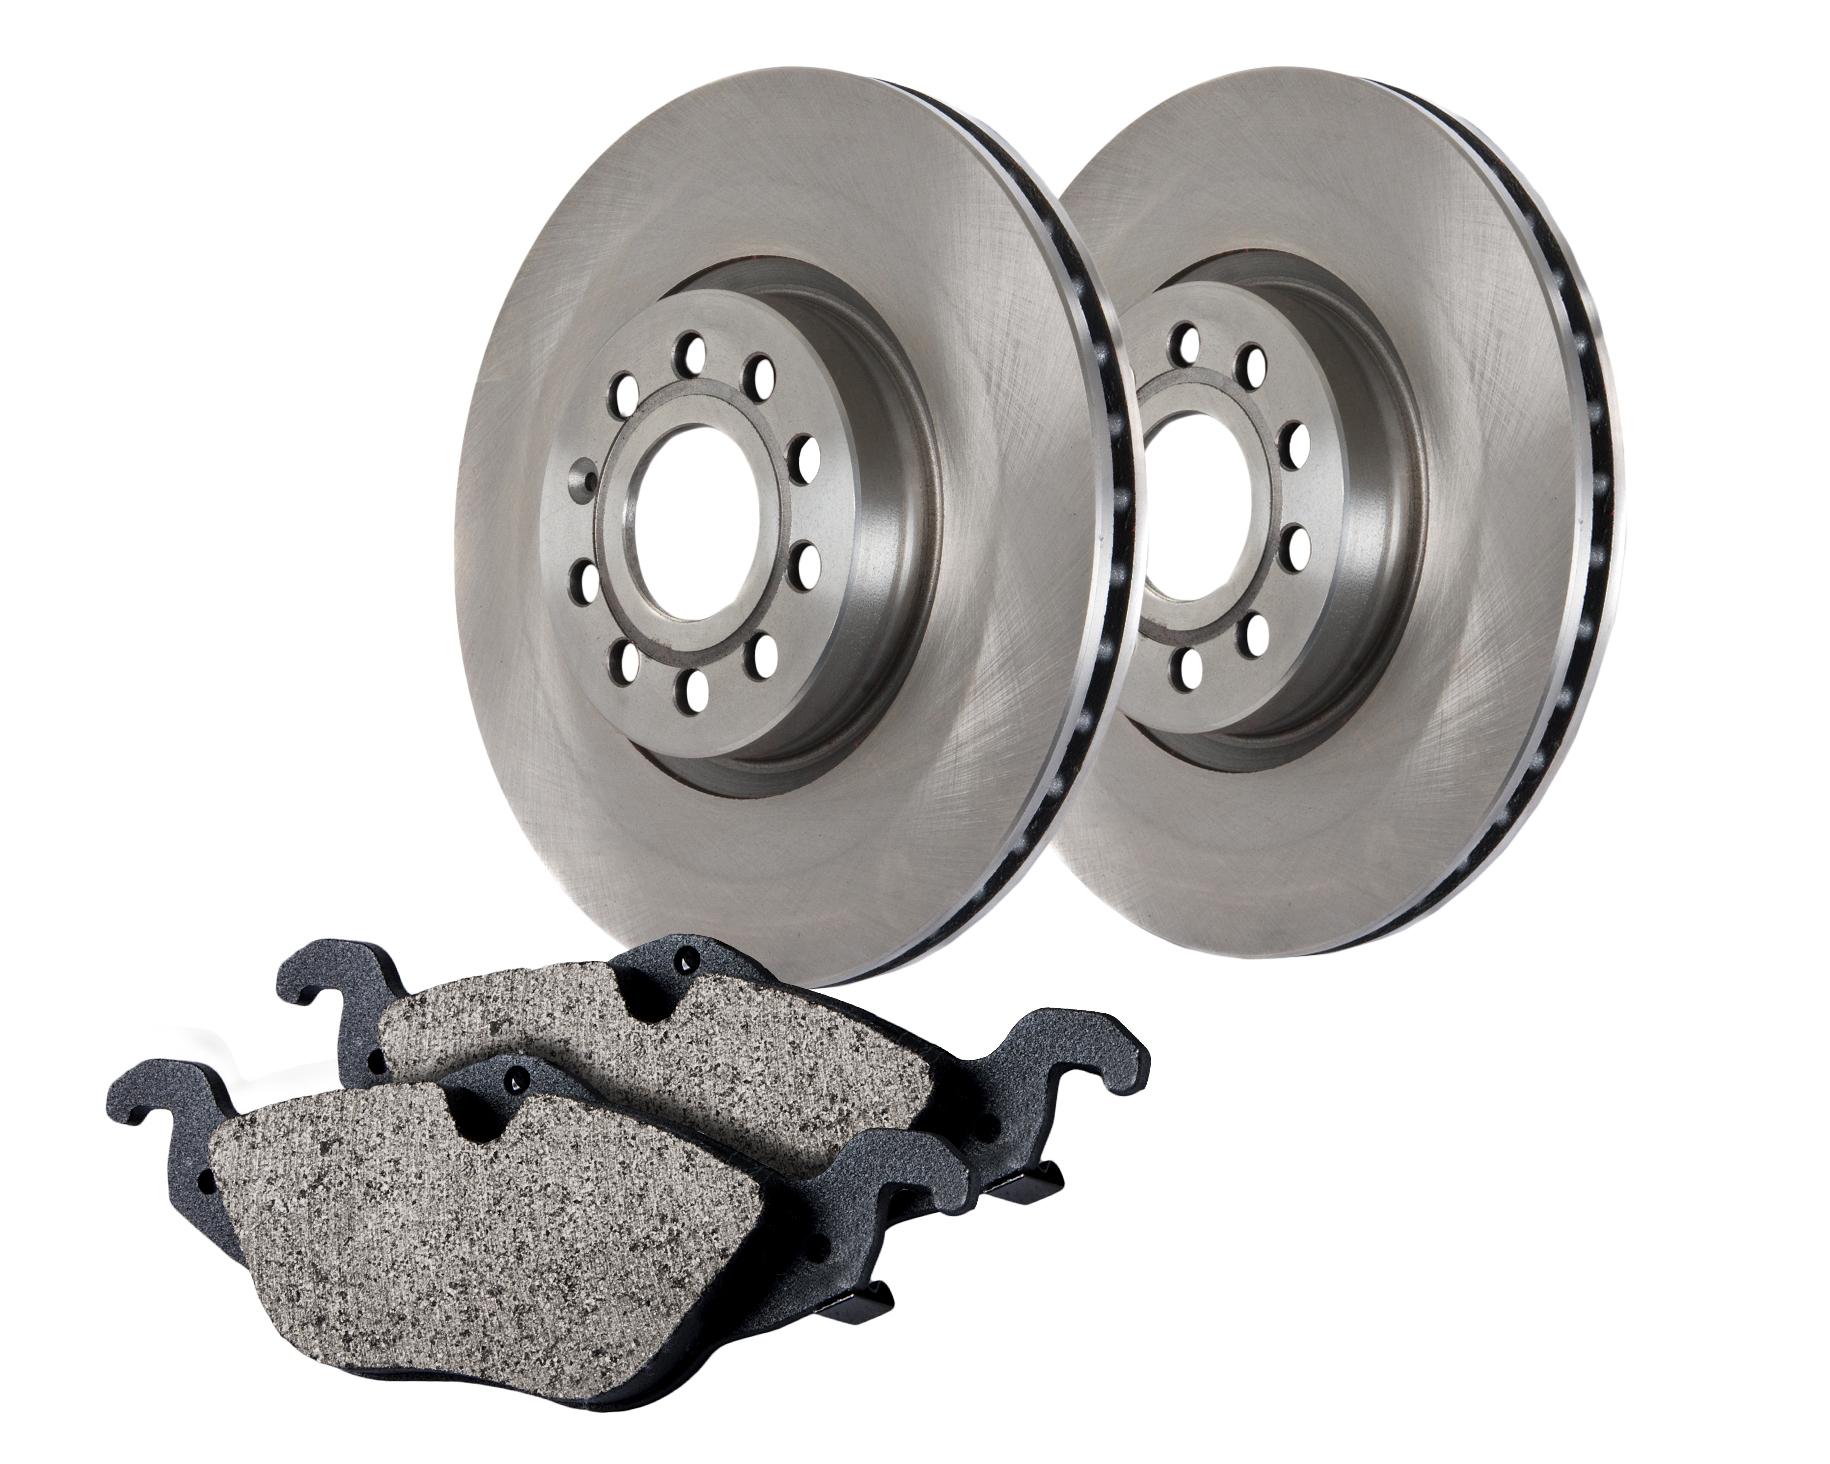 Centric Brake Parts 905.63015 Brake Rotor and Pad Kit, Premium, Semi-Metallic Pads, Iron, Natural, Mopar LC / LD-Body 2005-16, Kit